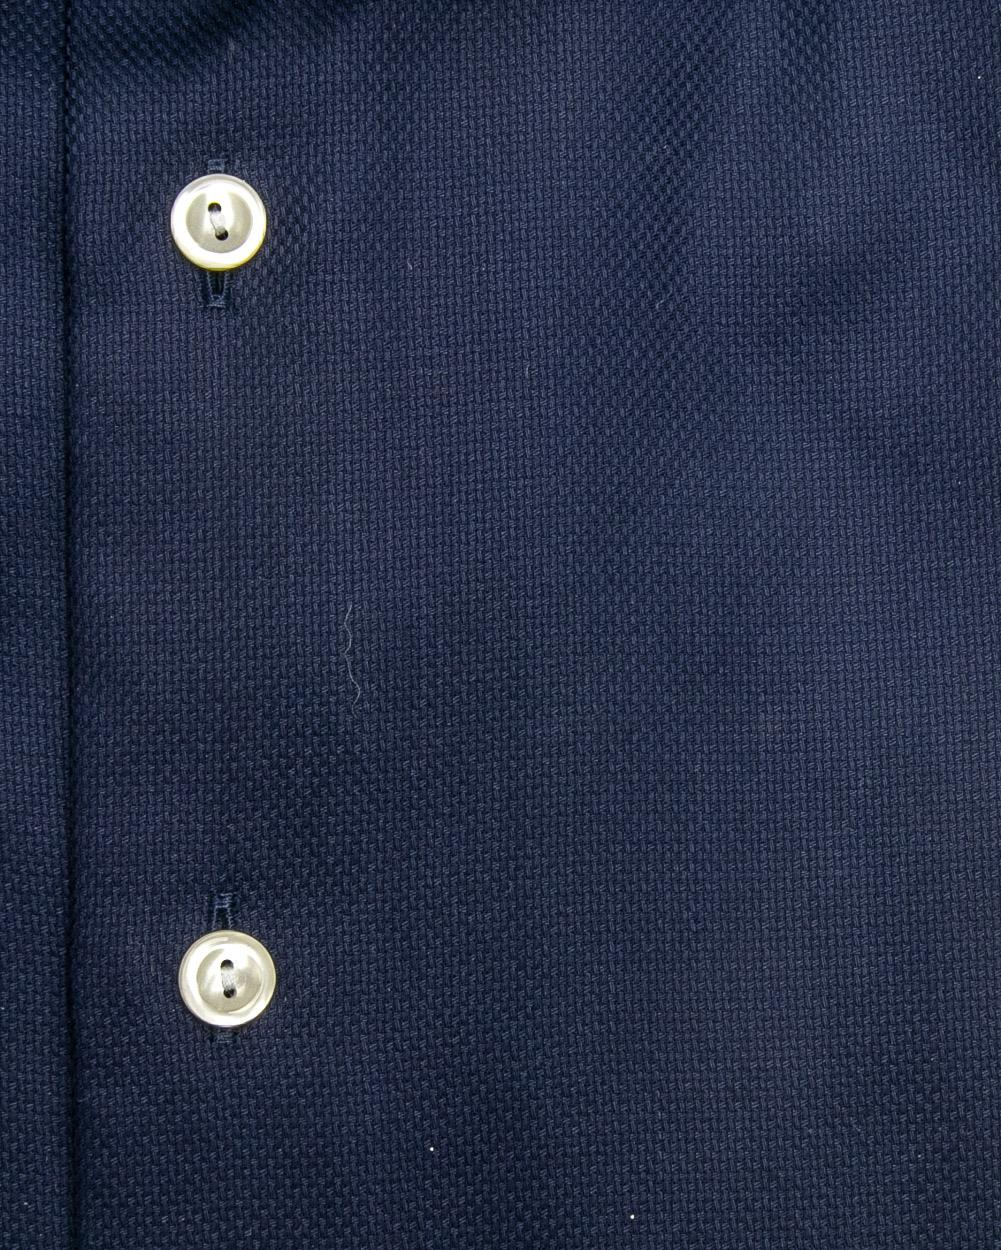 5a85c2101f3 Lyst - Eton of Sweden Blue Oxford Dress Shirt in Blue for Men